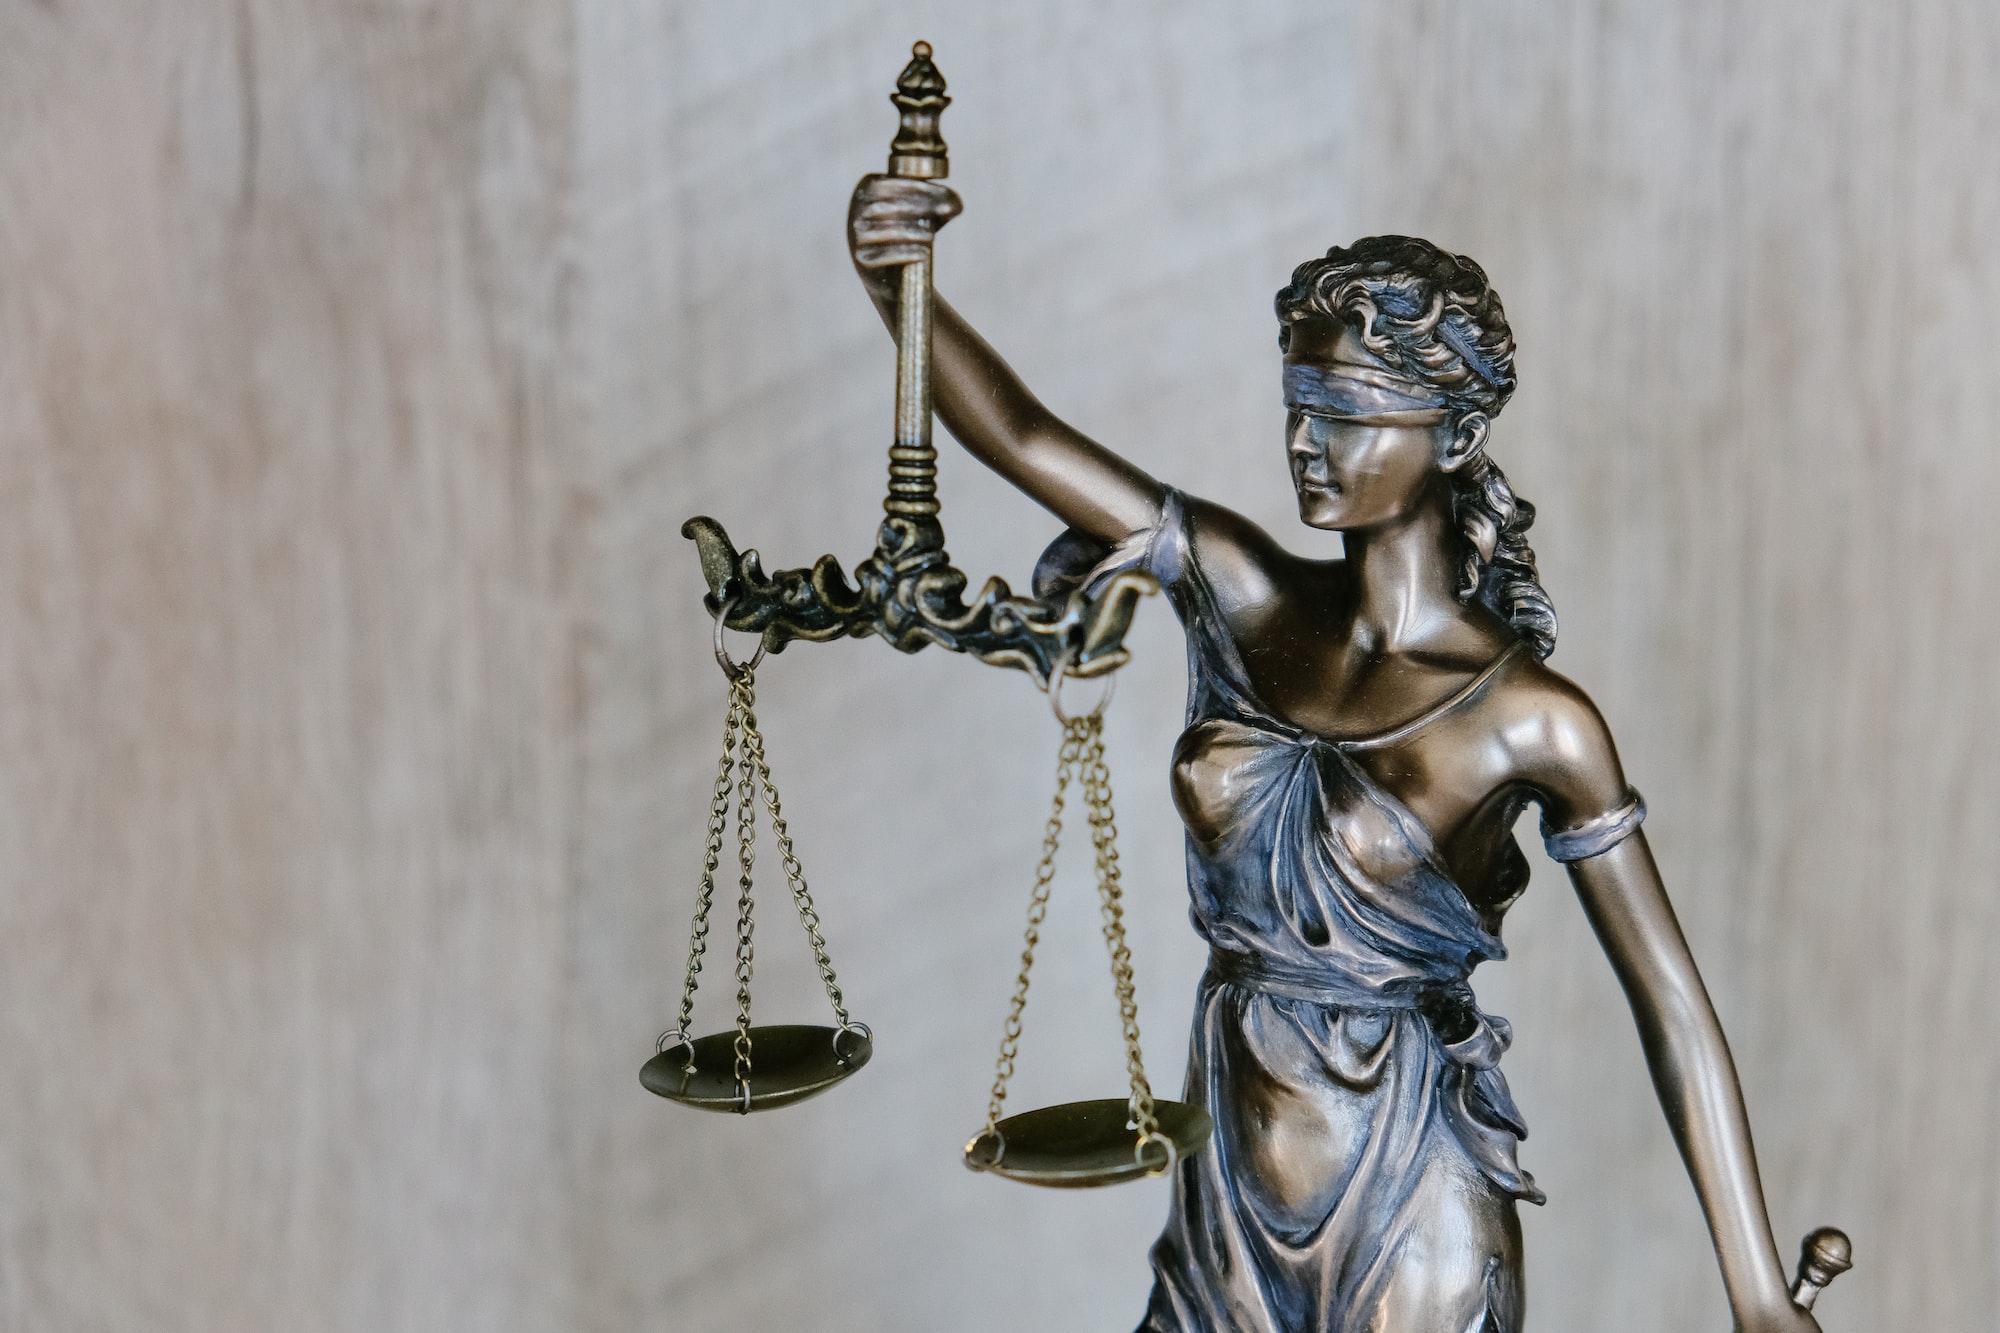 Lawyer-LSA Divorce, Amazon Boots 3K Fraudsters, Facebook = Philip Morris?